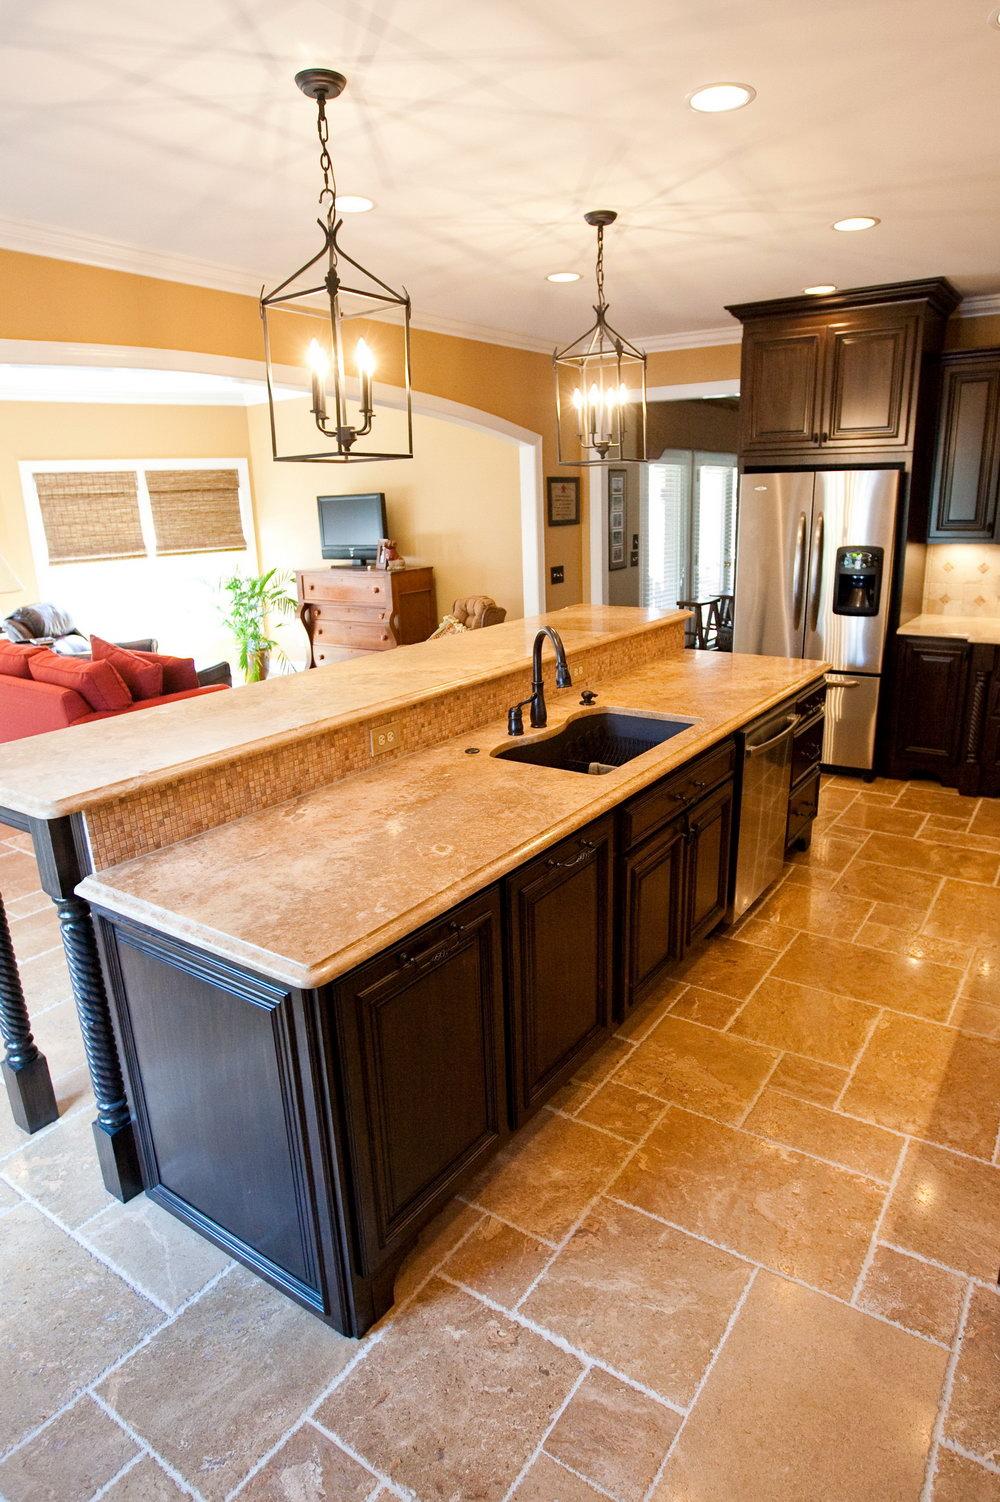 Standard Kitchen Cabinet Height From Floor